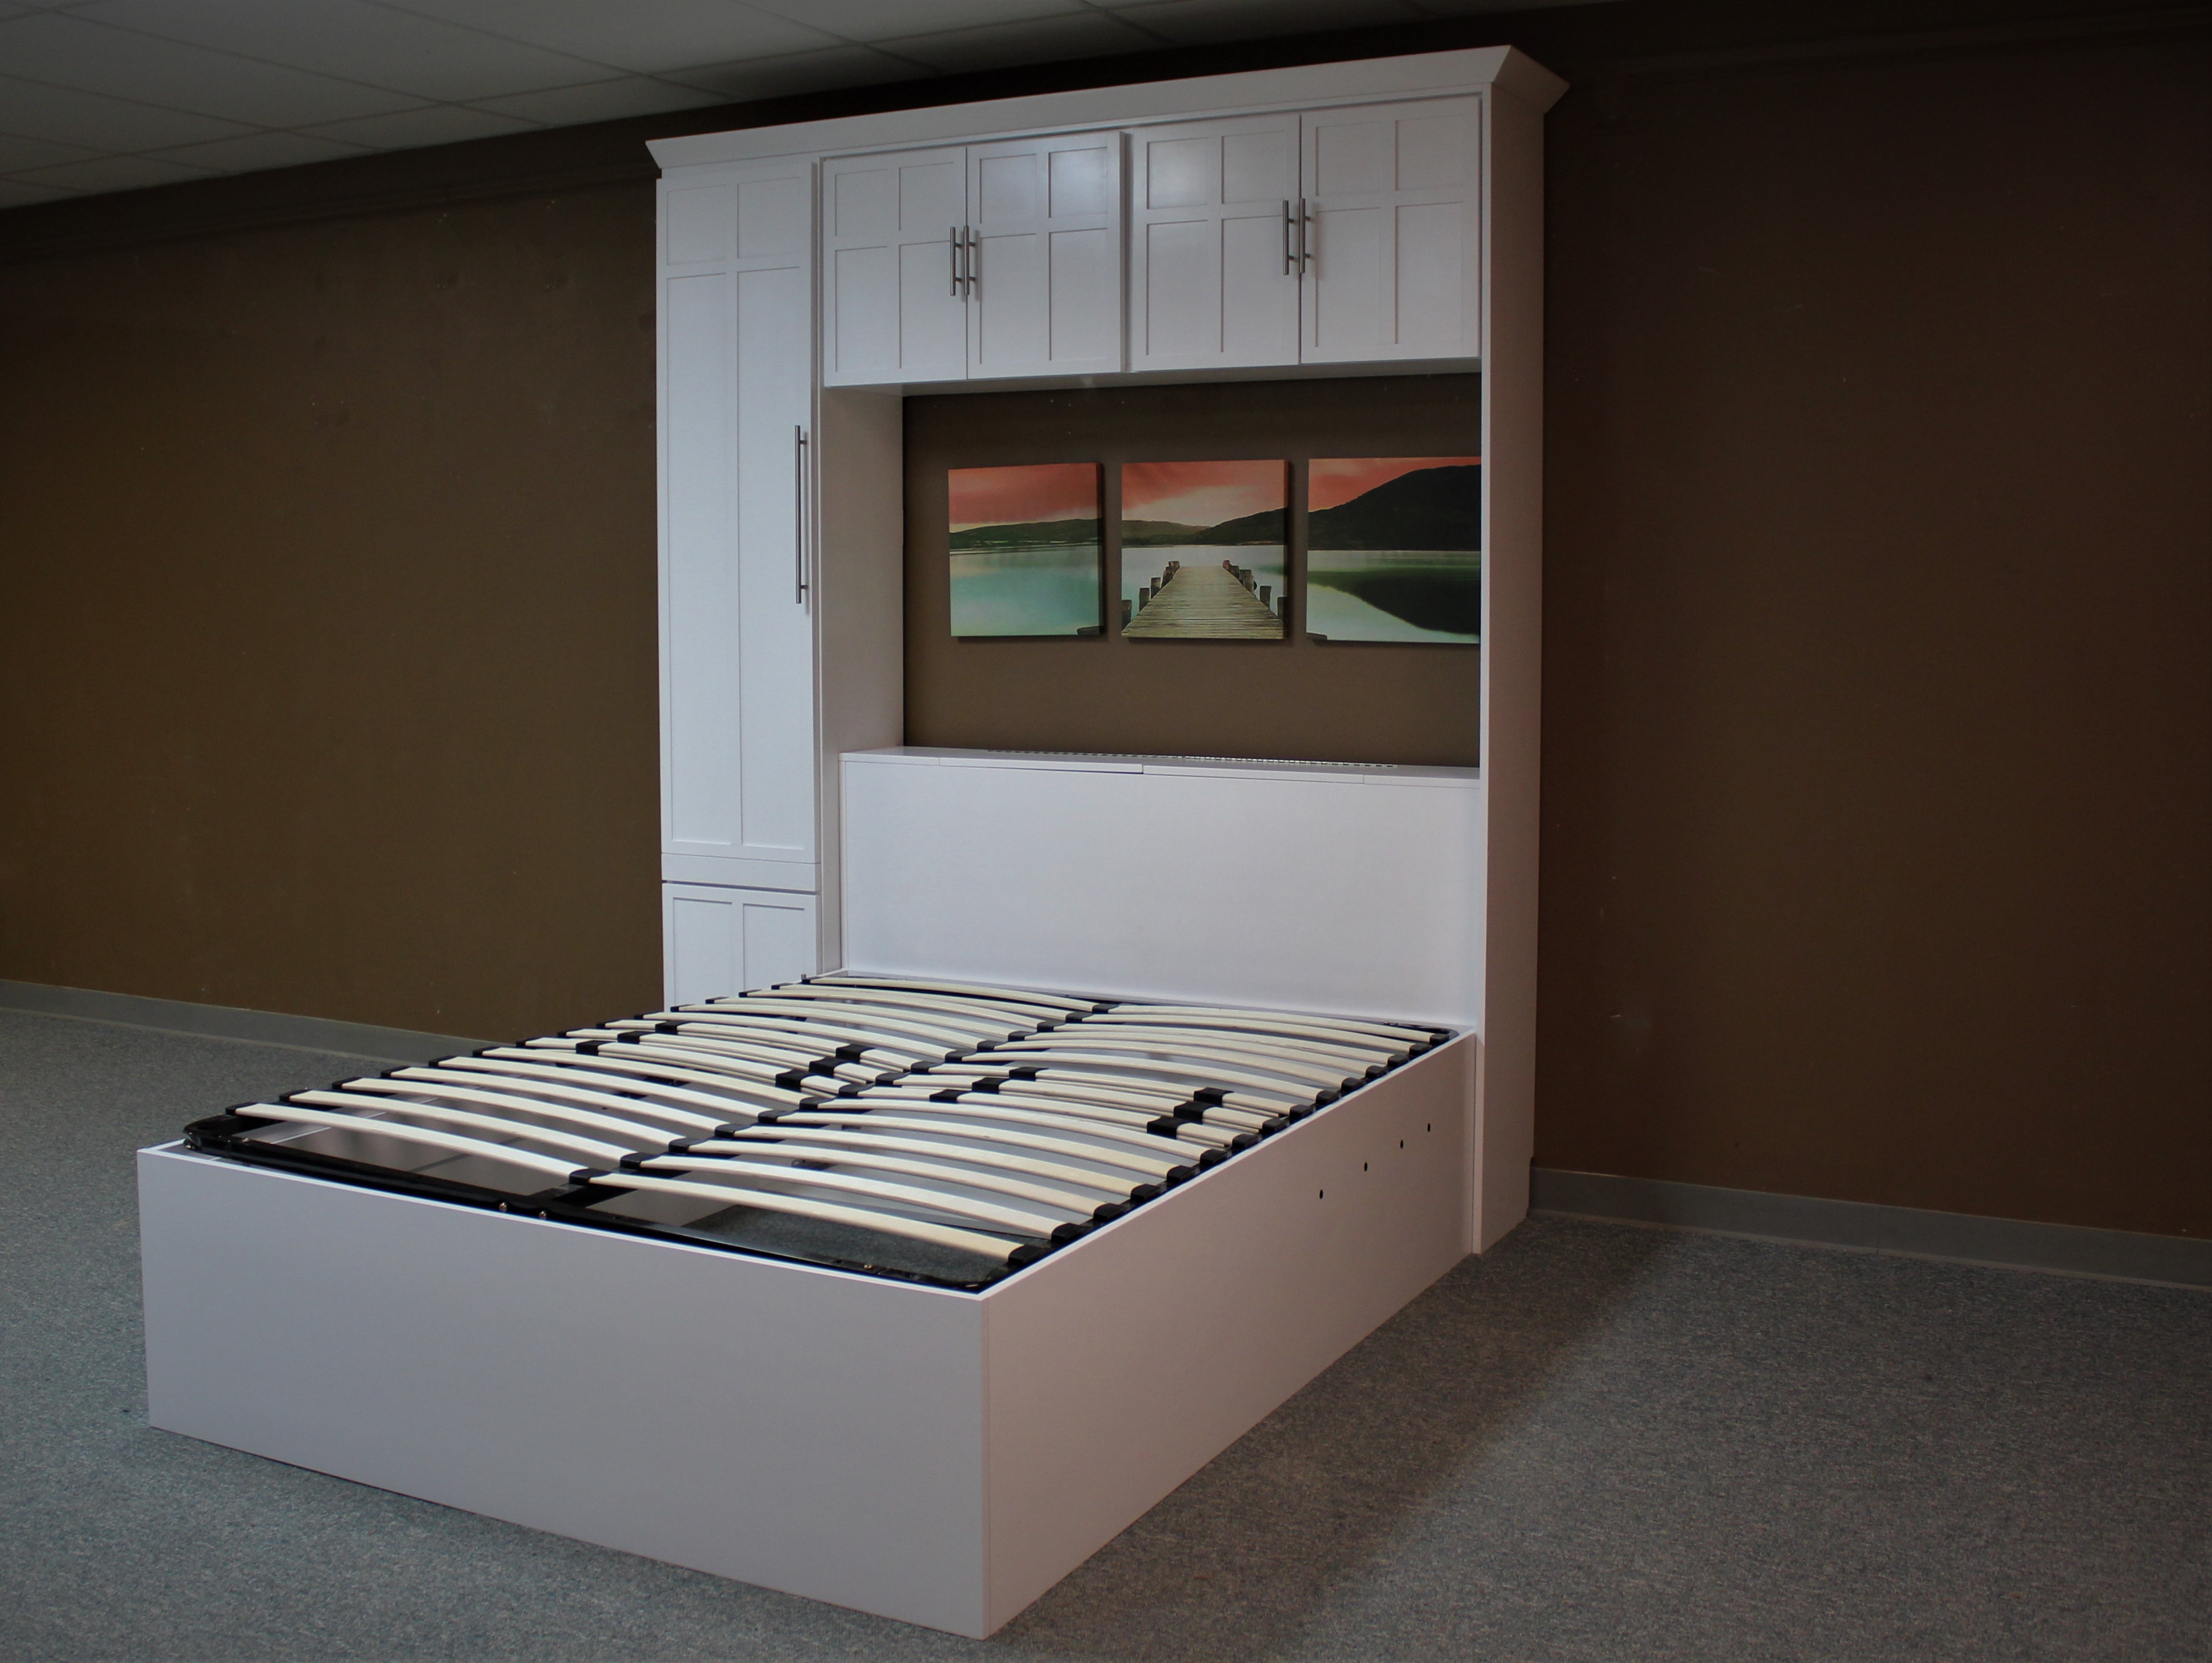 Lift Bed No Mattress